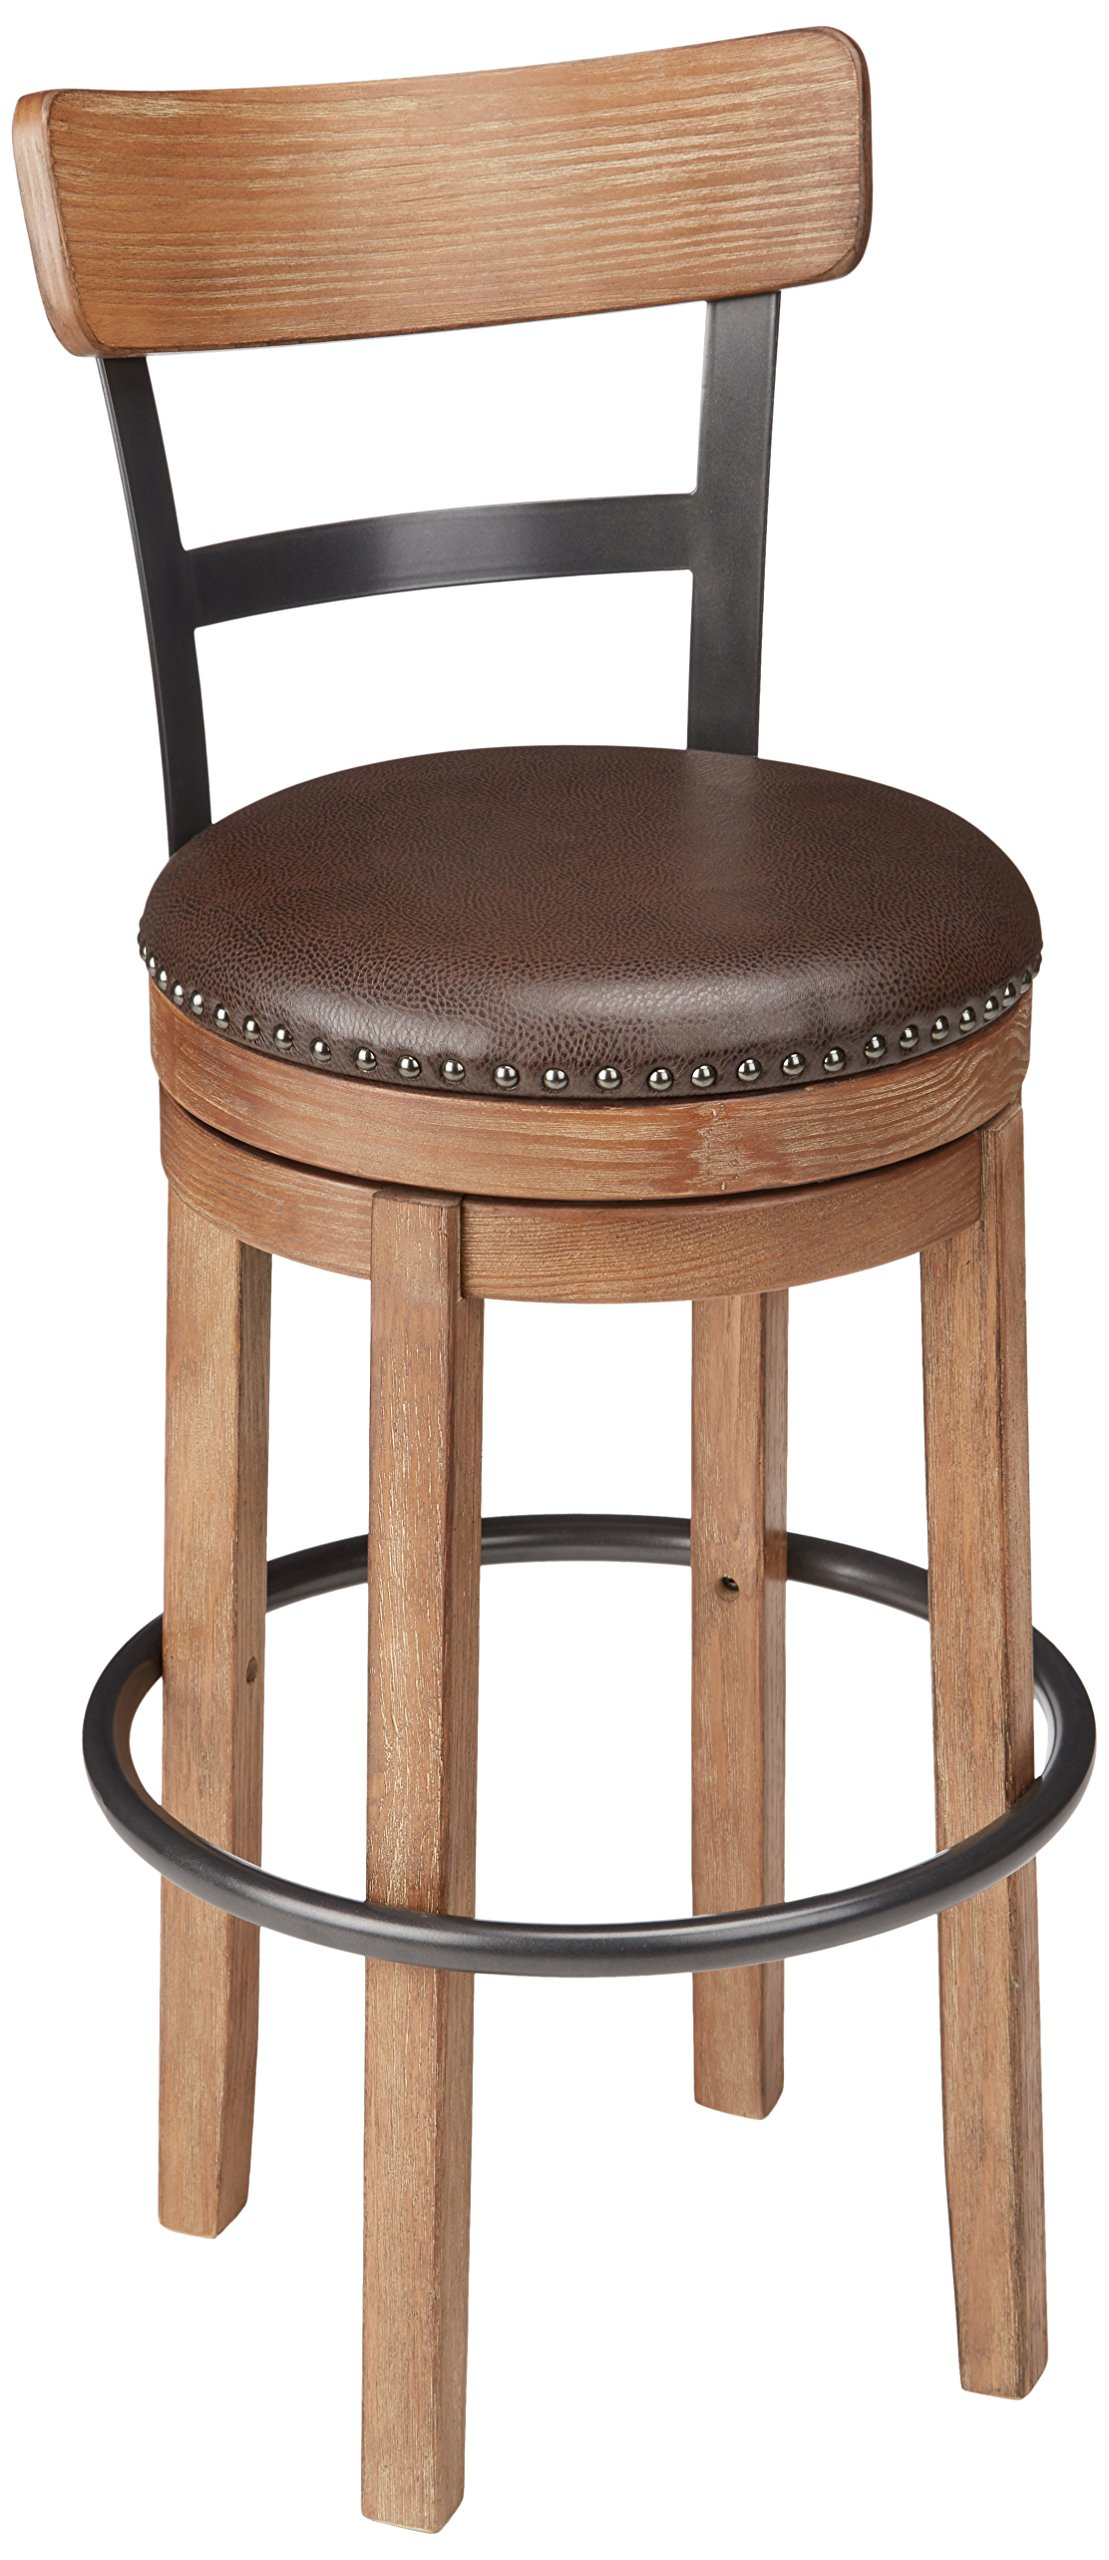 Ashley Furniture Signature Design - Pinnadel Swivel Bar Stool - Pub Height - Light Brown by Signature Design by Ashley